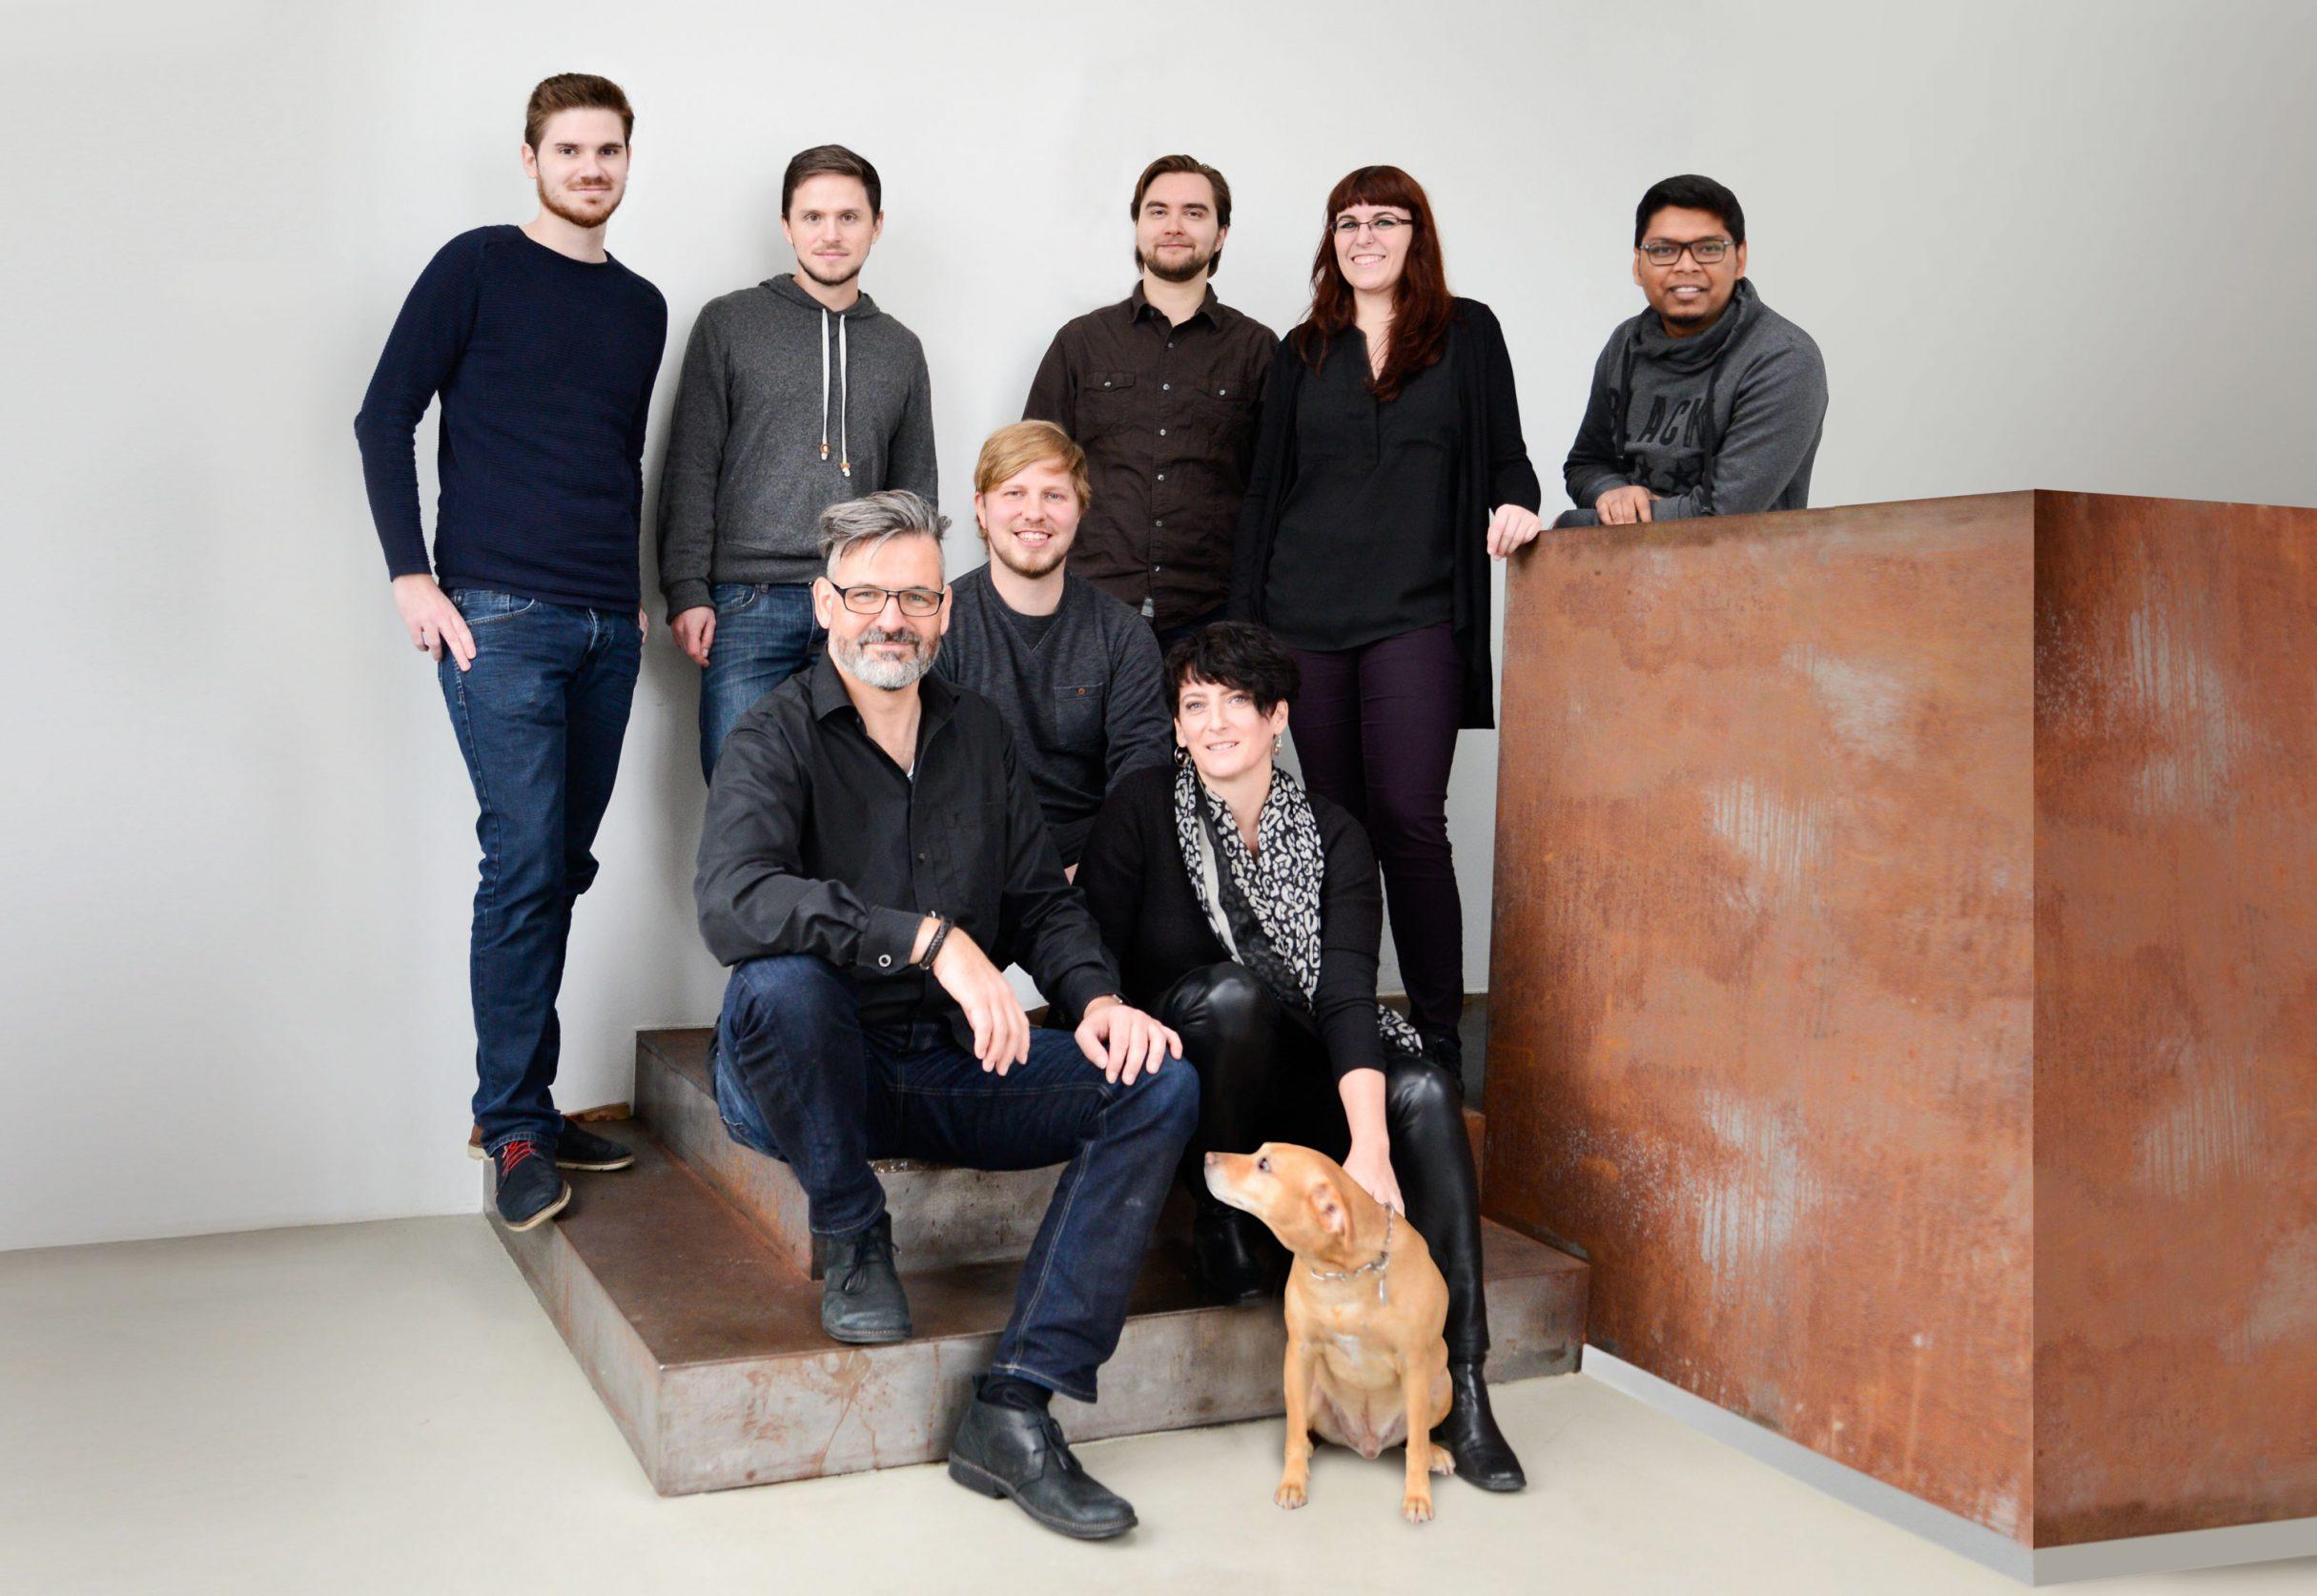 Teamfoto: DIE NEUDENKER® Agentur, Darmstadt